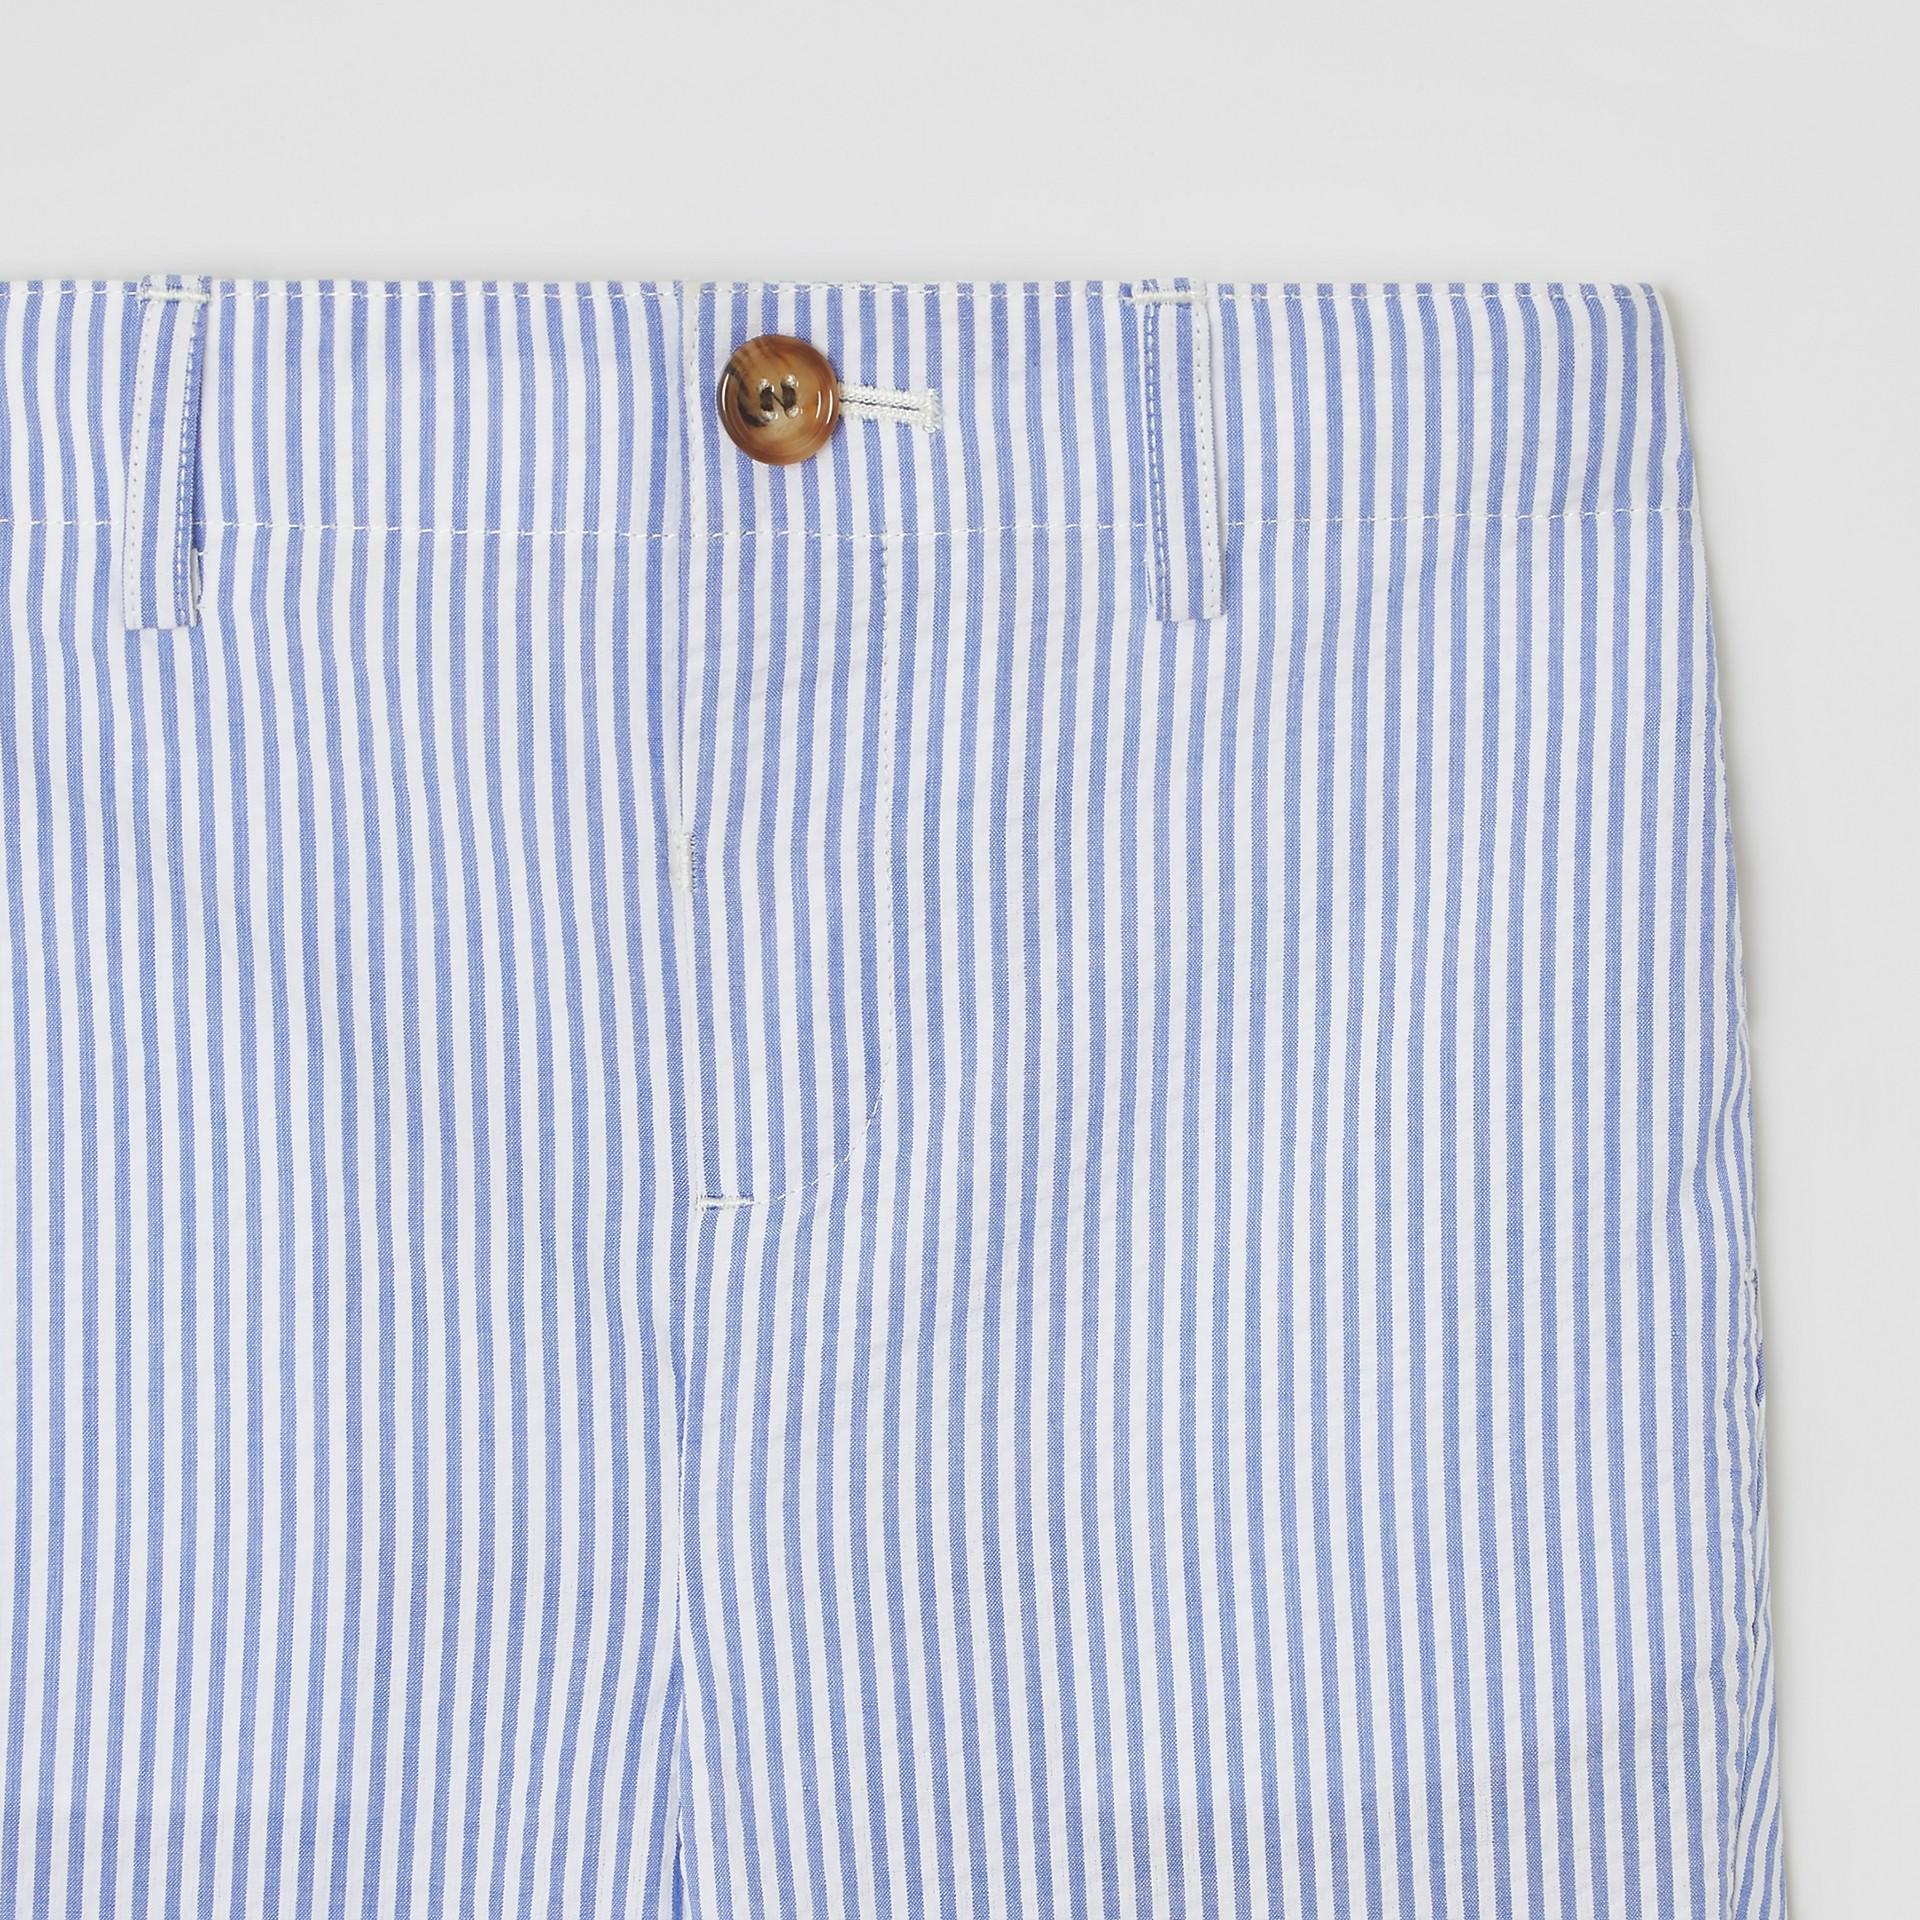 Striped Cotton Seersucker Tailored Trousers in Cornflower Blue - Children | Burberry United Kingdom - gallery image 4